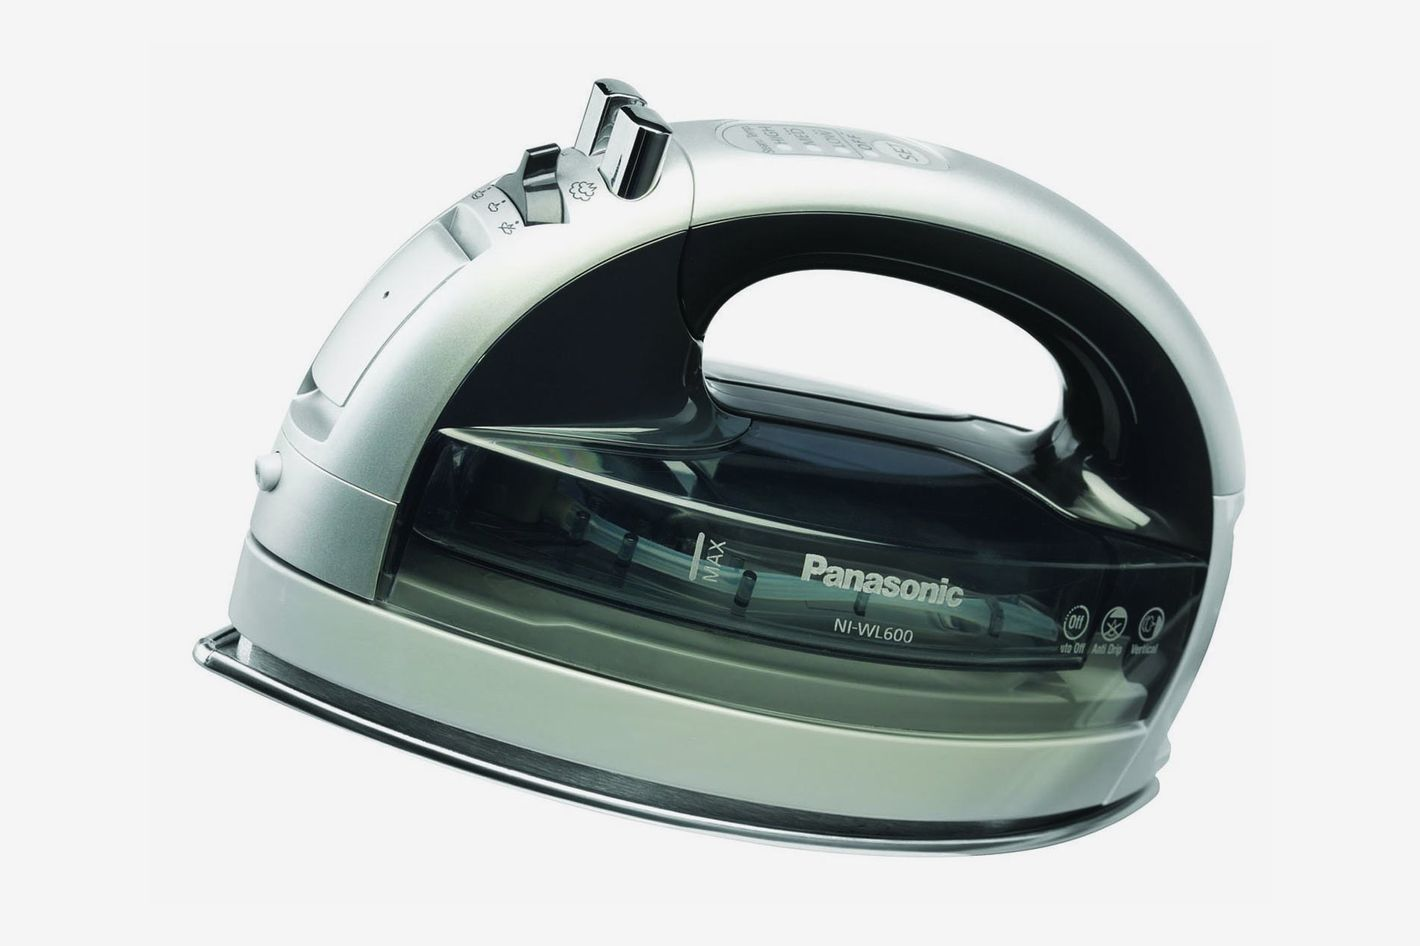 Panasonic NI-WL600 Cordless Multi-Directional Iron